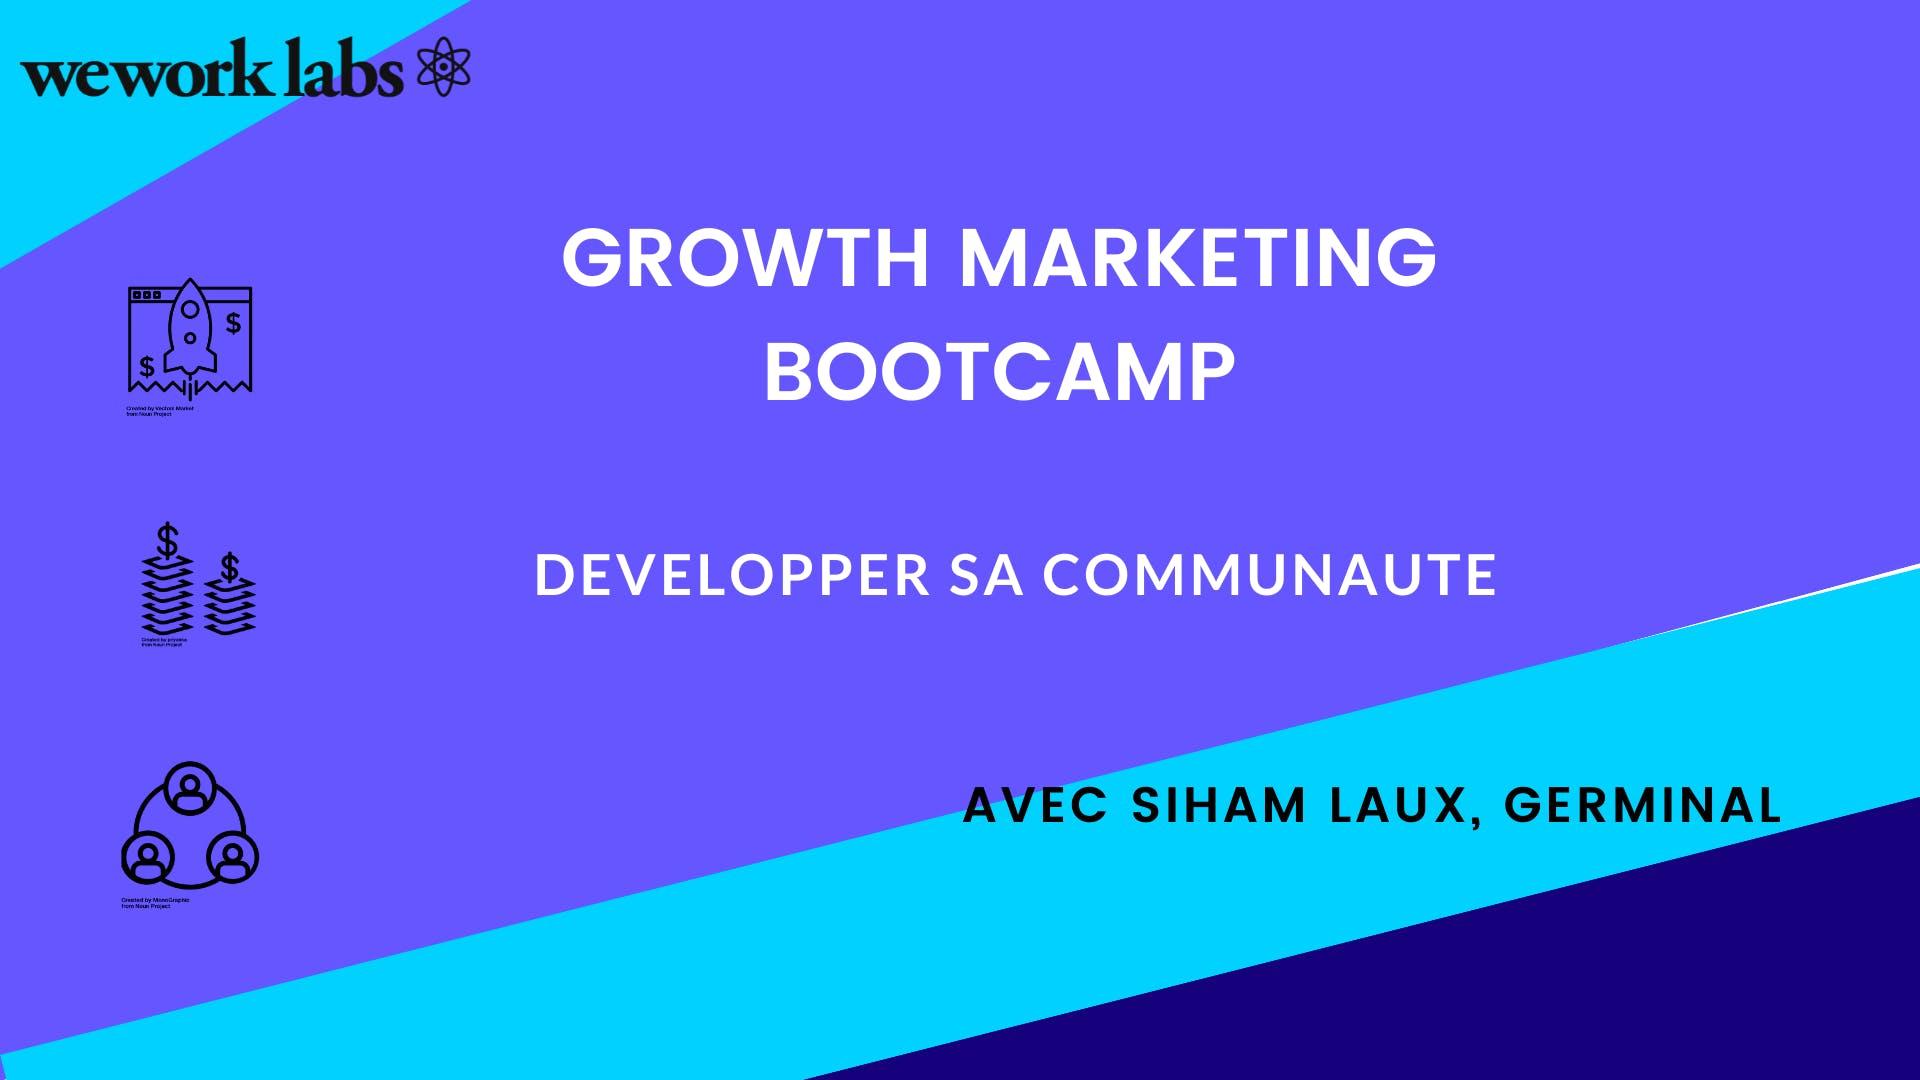 Growth Marketing Bootcamp - Développer sa Communauté (5/5)